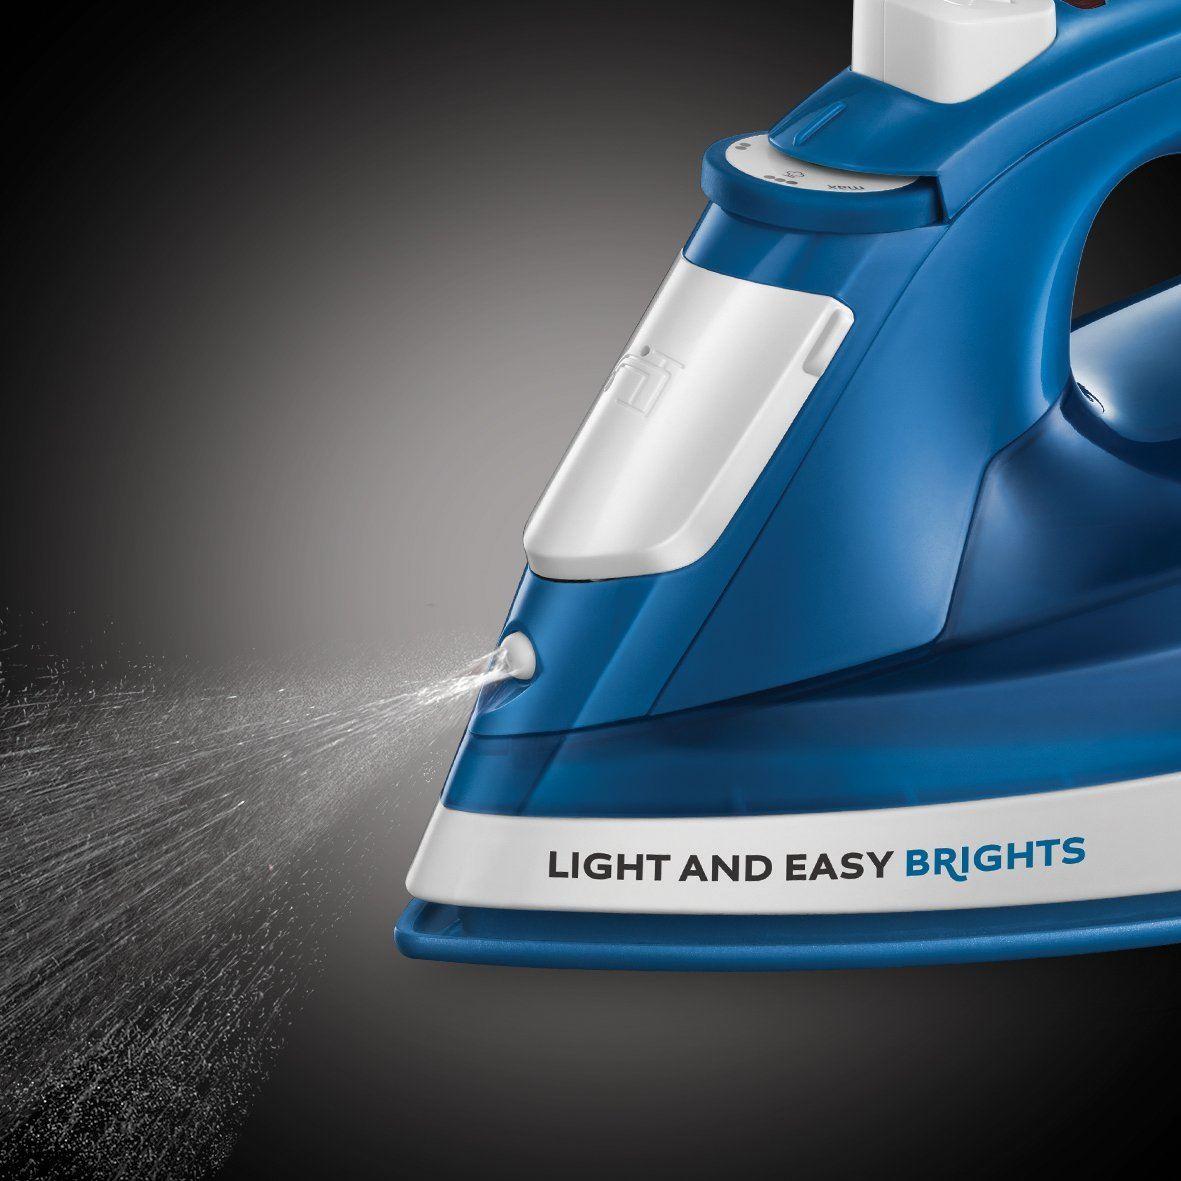 Russell-Hobbs-24840-LIGHT-amp-EASY-brillants-Fer-a-vapeur-avec-Ceramique-Semelle-2400-W